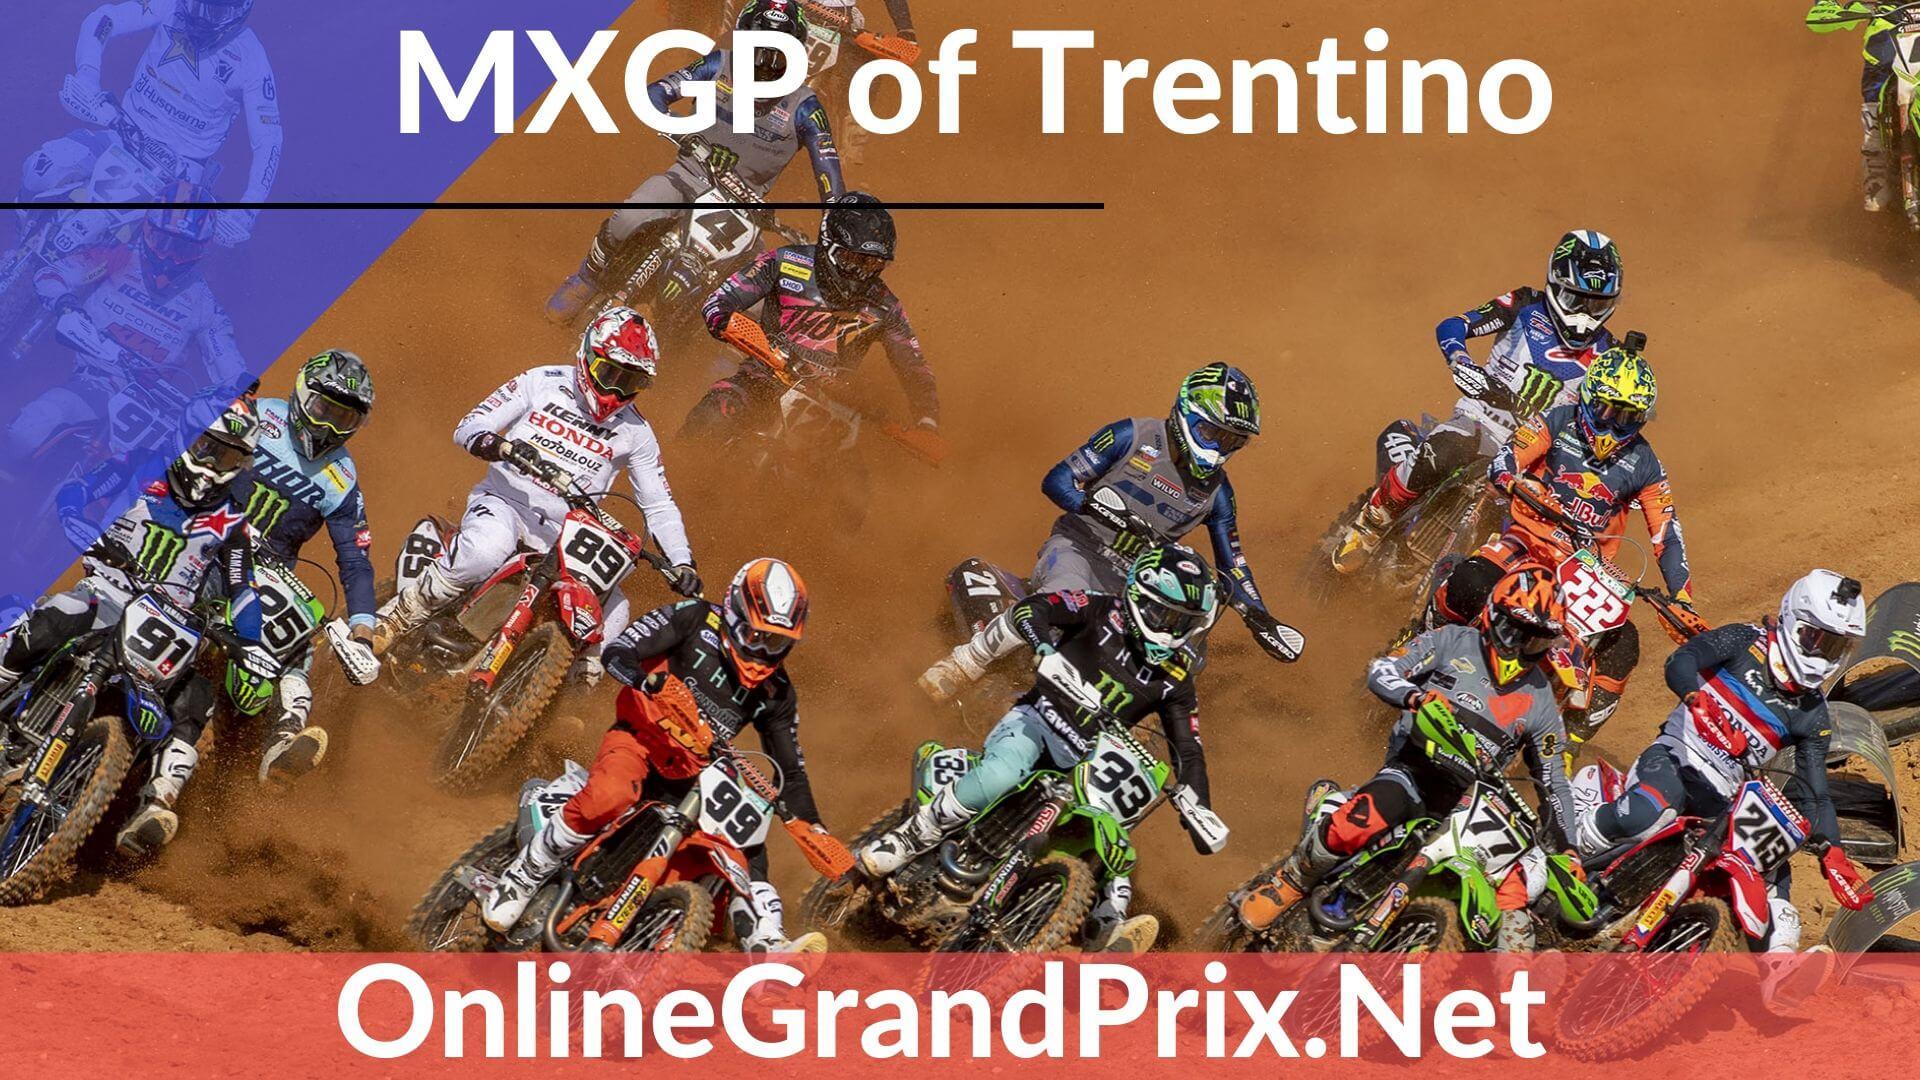 Trentino MXGP Live stream 2020 | FIM Motocross WC